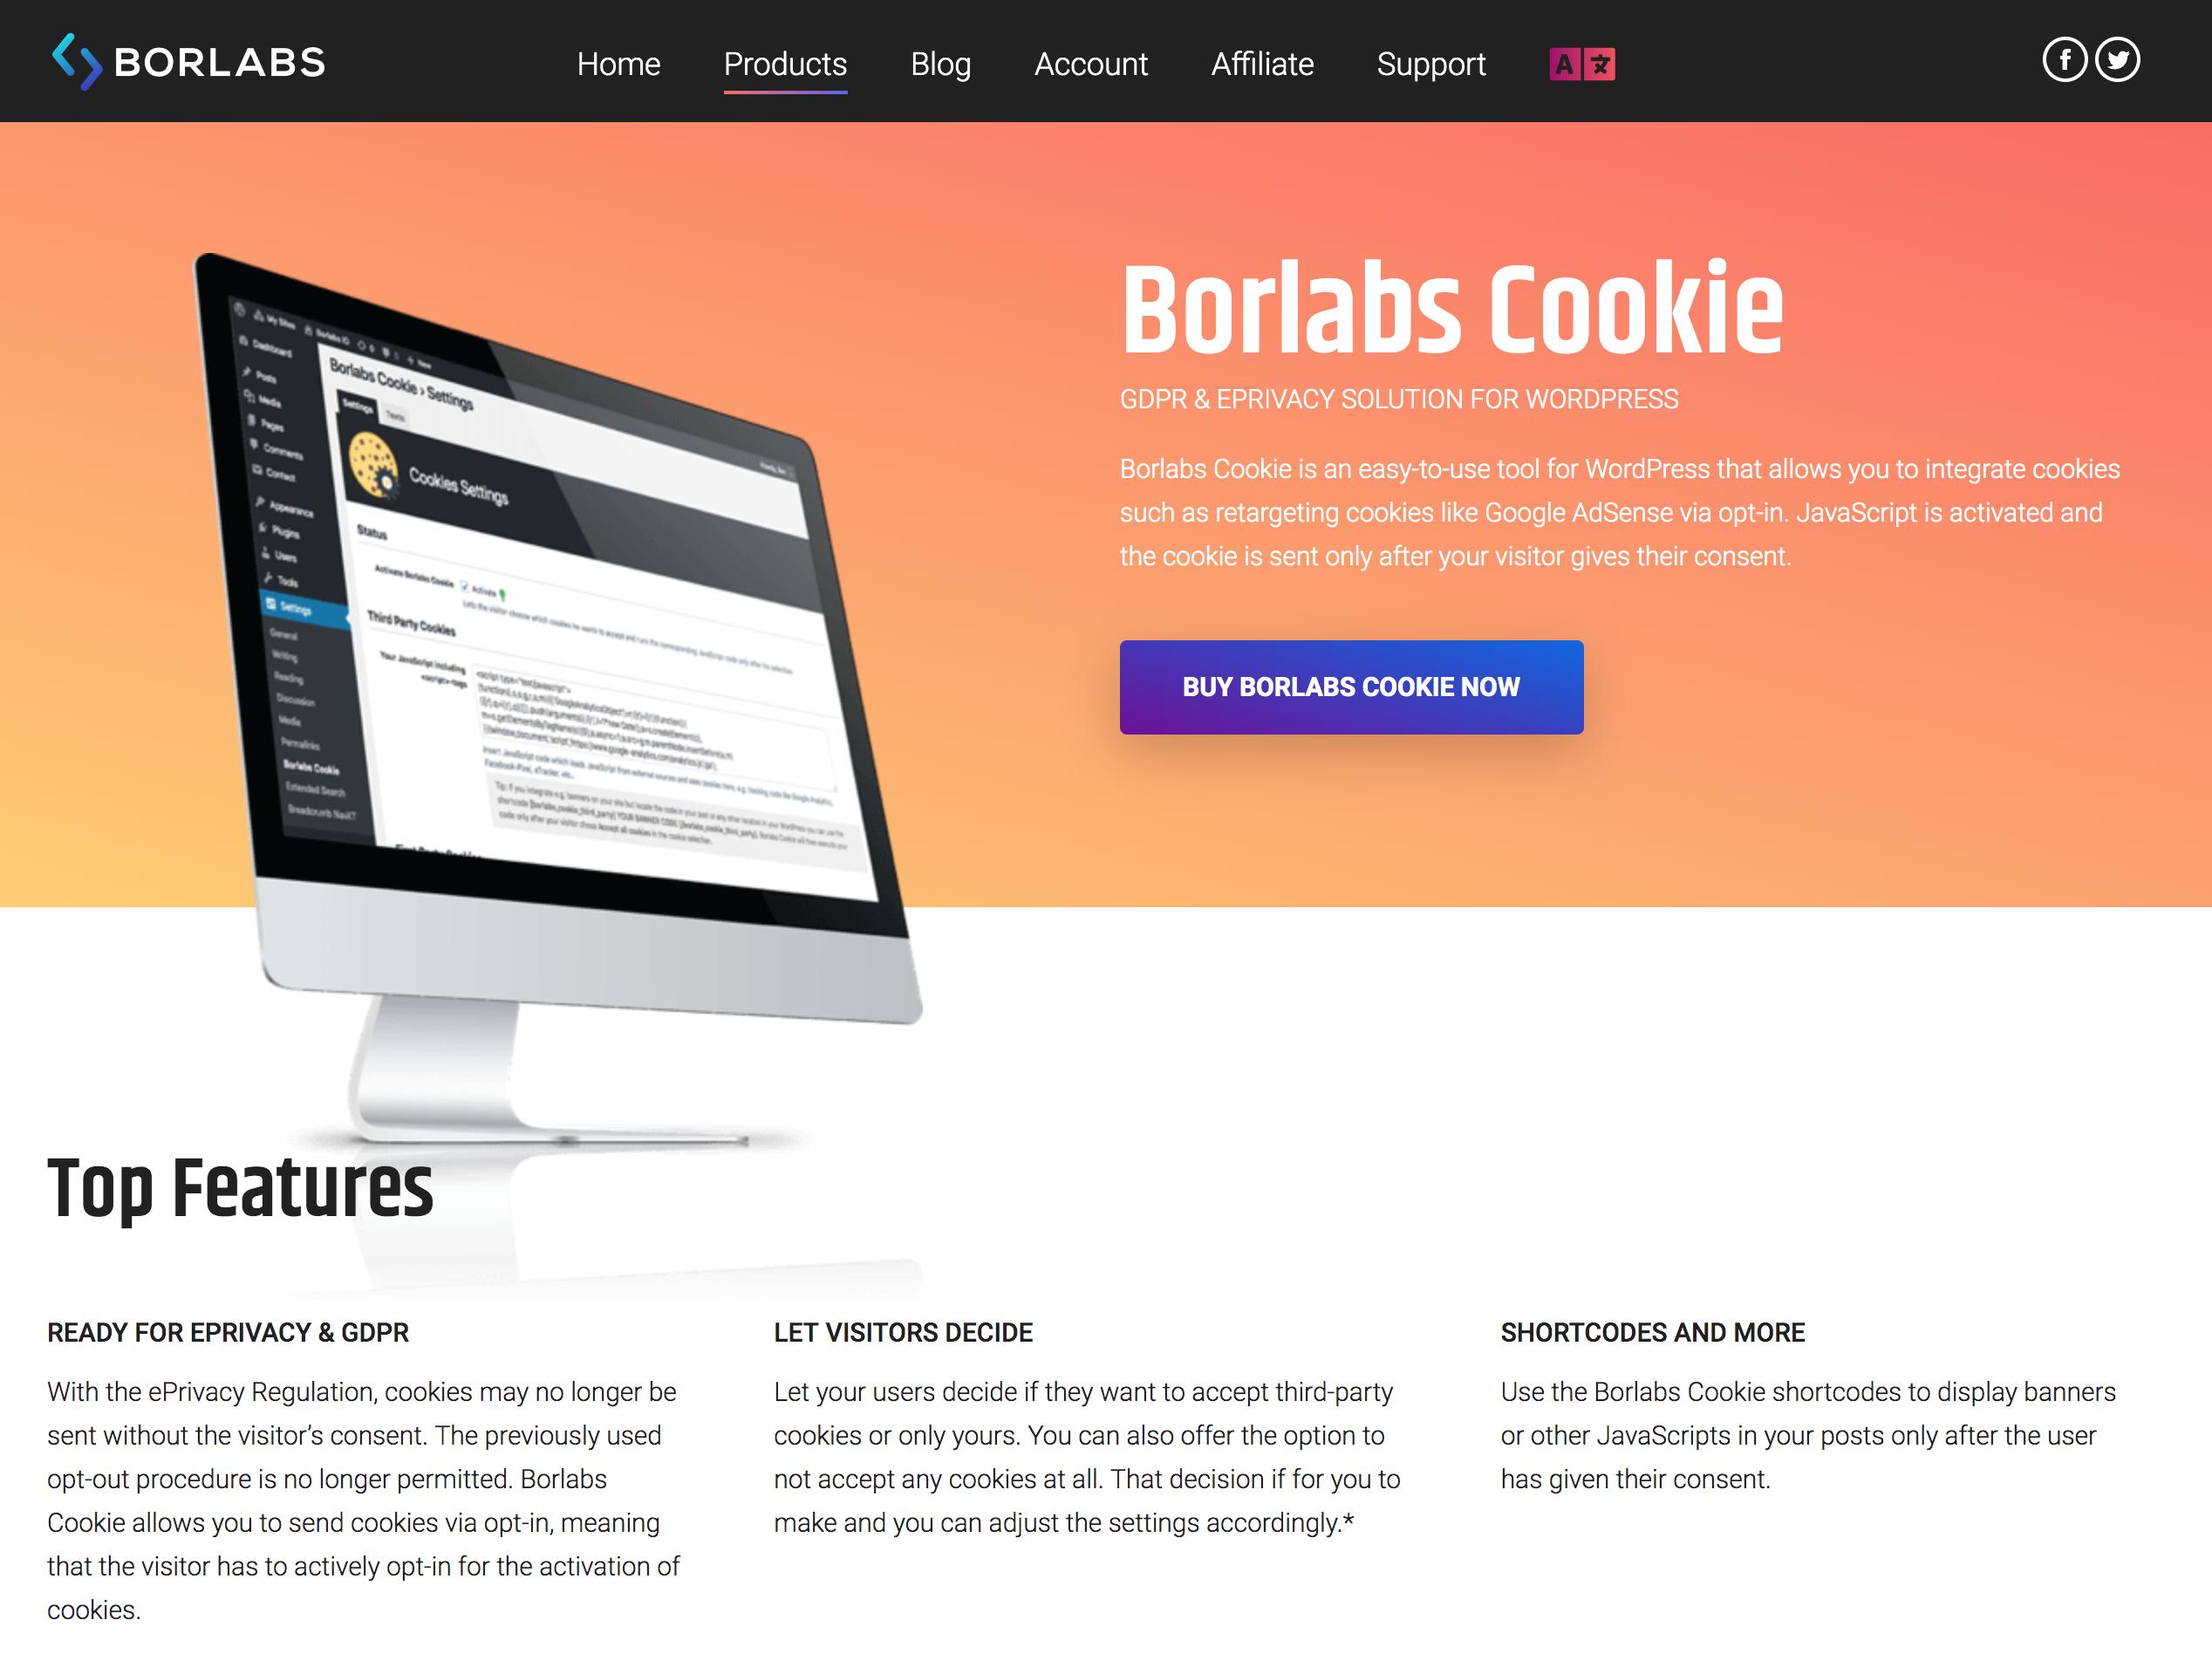 Borlabs Cookie webpage